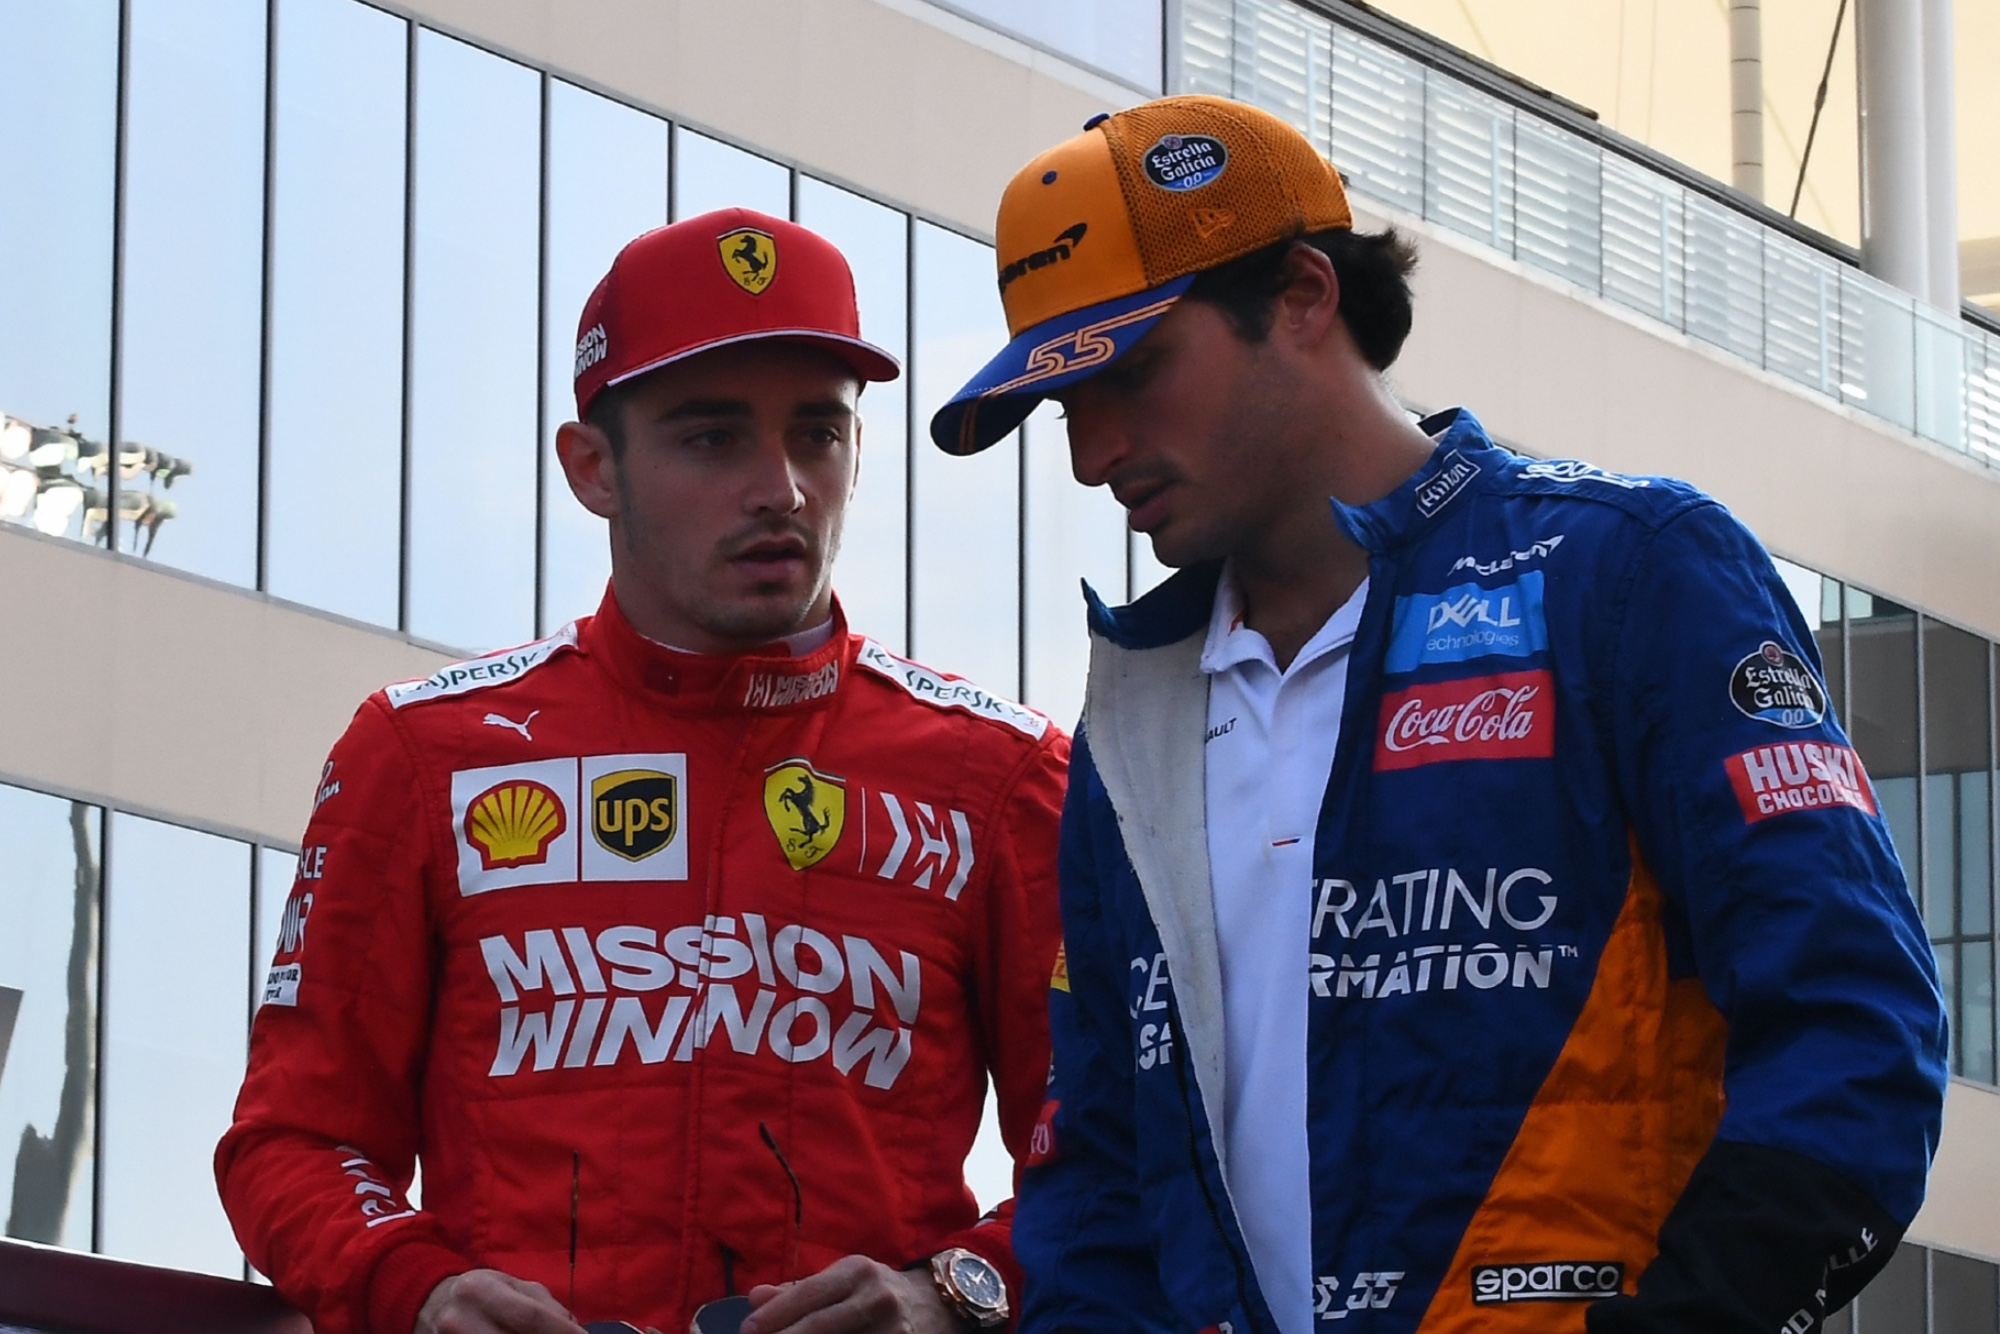 Charles Leclerc and Carlos Sainz, Abu Dhabi 2019